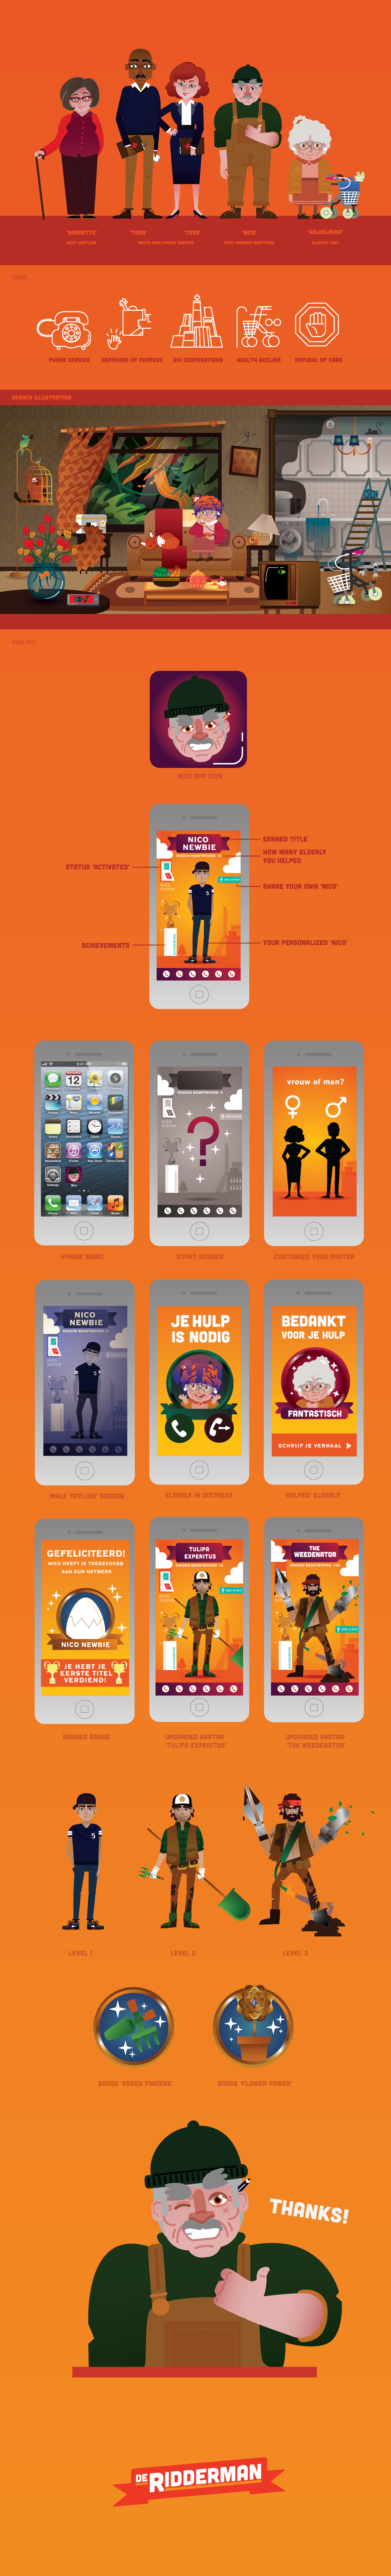 helpdesk help desk Elderly app search illustration hosts old nico activation gamification helping social avatar customization